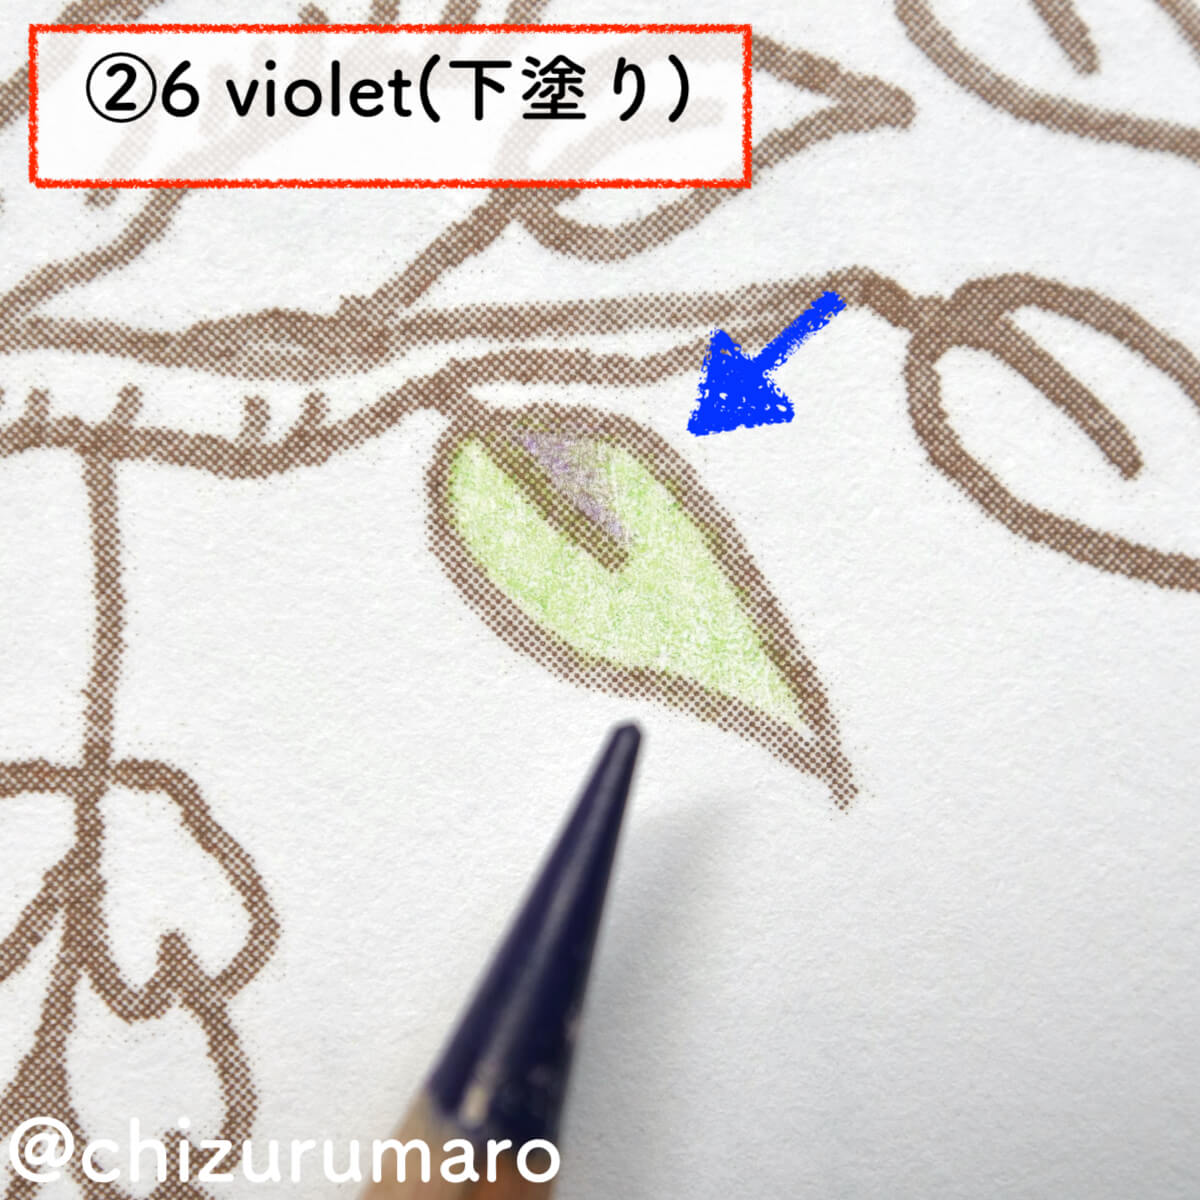 f:id:chizurumaro:20201105212406j:plain